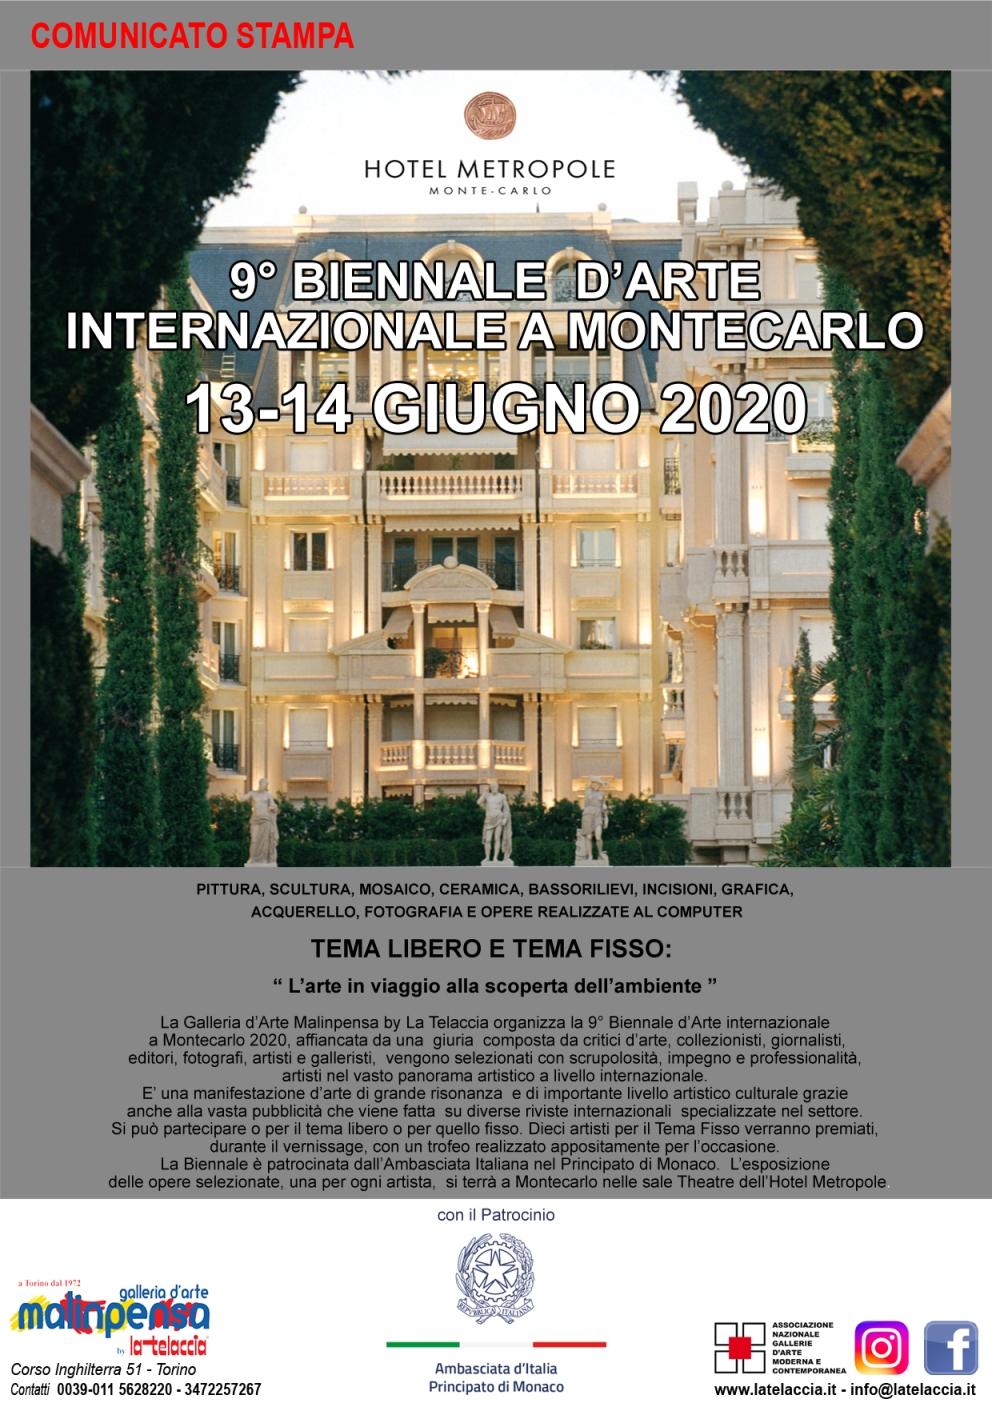 COMUNICATO STAMPA_BIENNALE.jpg